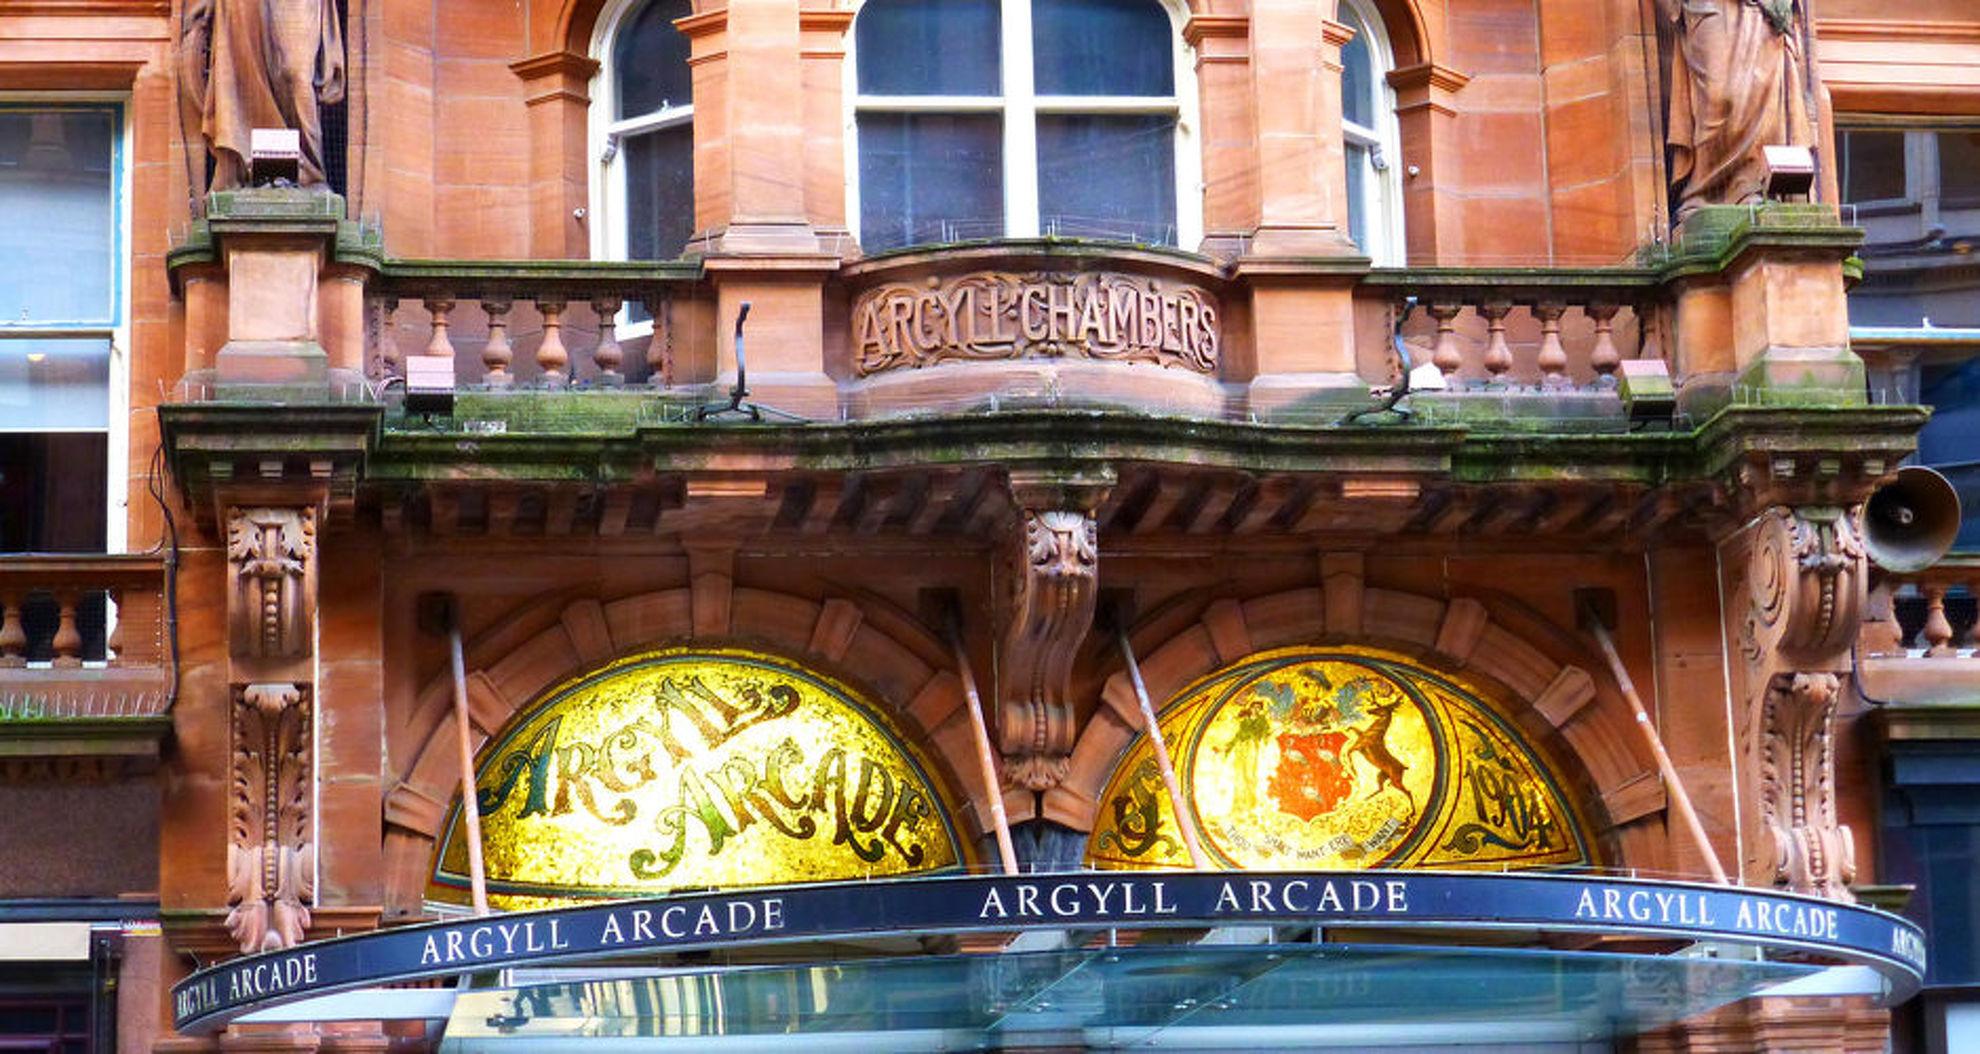 Explore Argyll Arcade